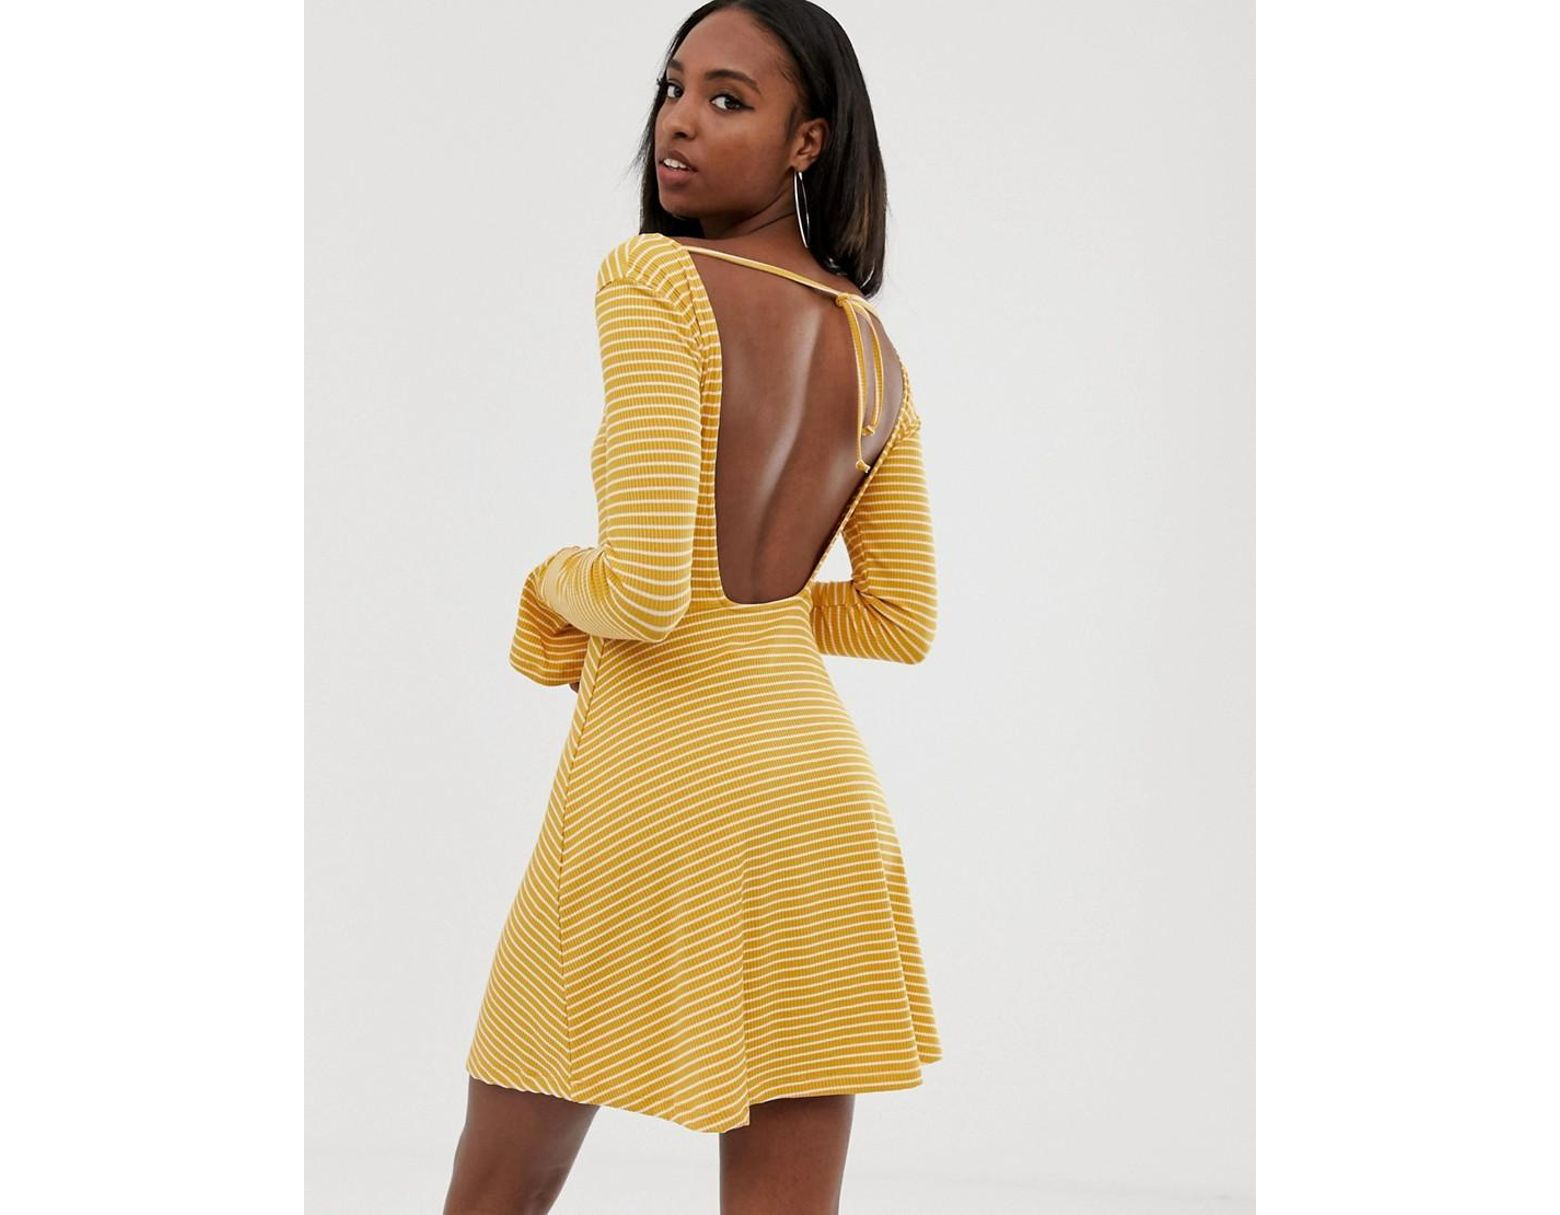 d723b4c73f6 ASOS Asos Design Tall Open Back Mini Skater Dress With Faux Tortoiseshell  Detail In Rib Stripe in Yellow - Lyst